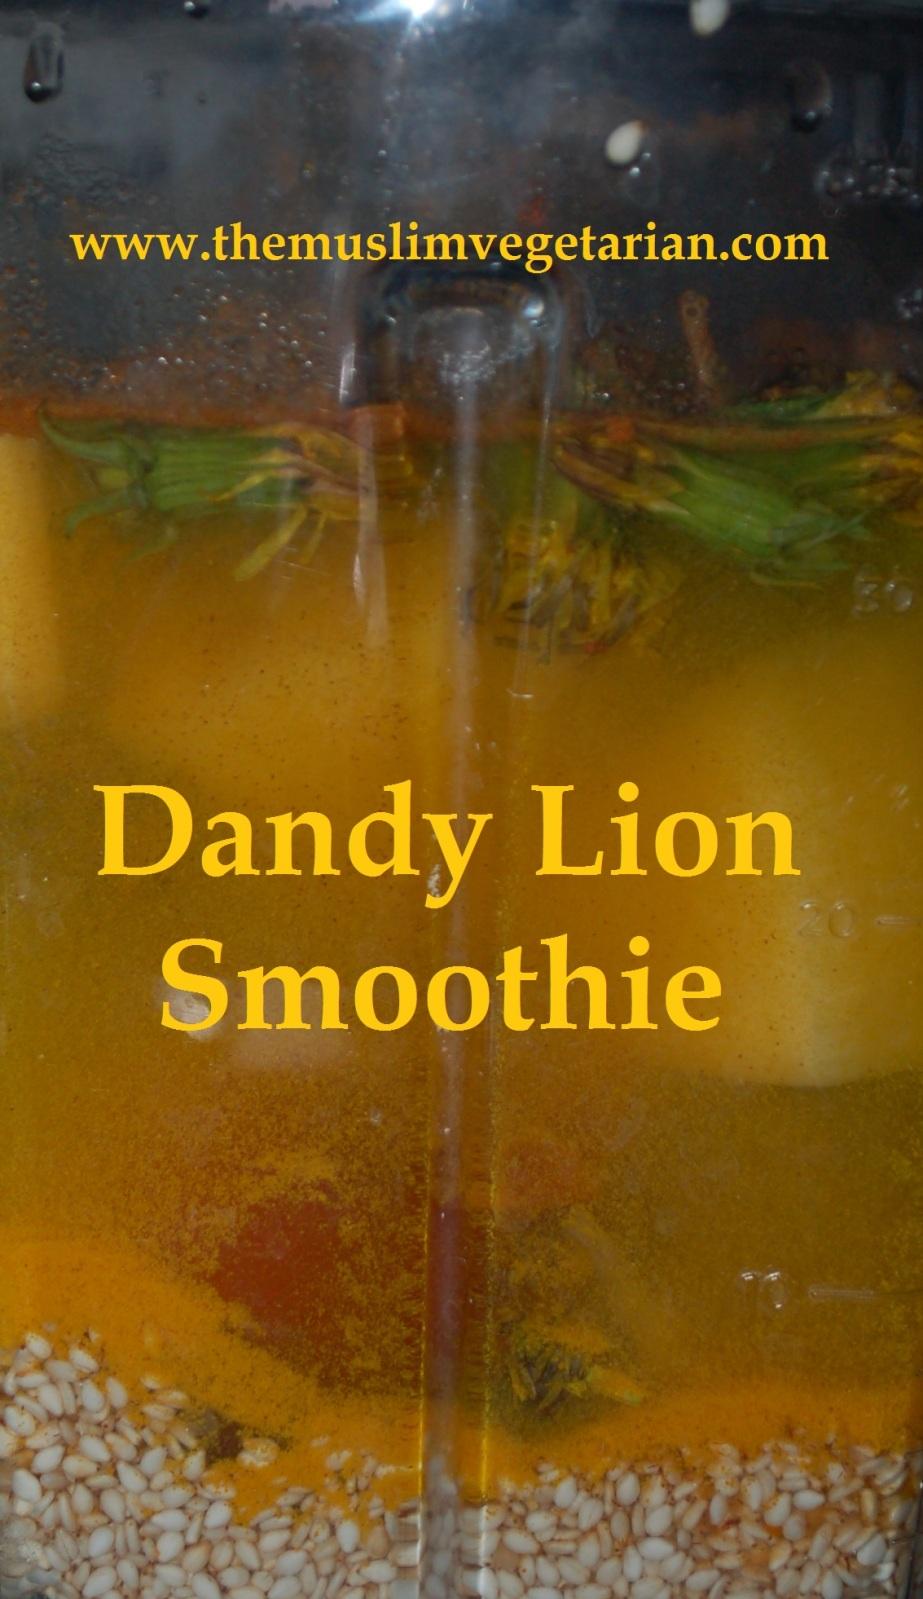 Dandelion Smoothie